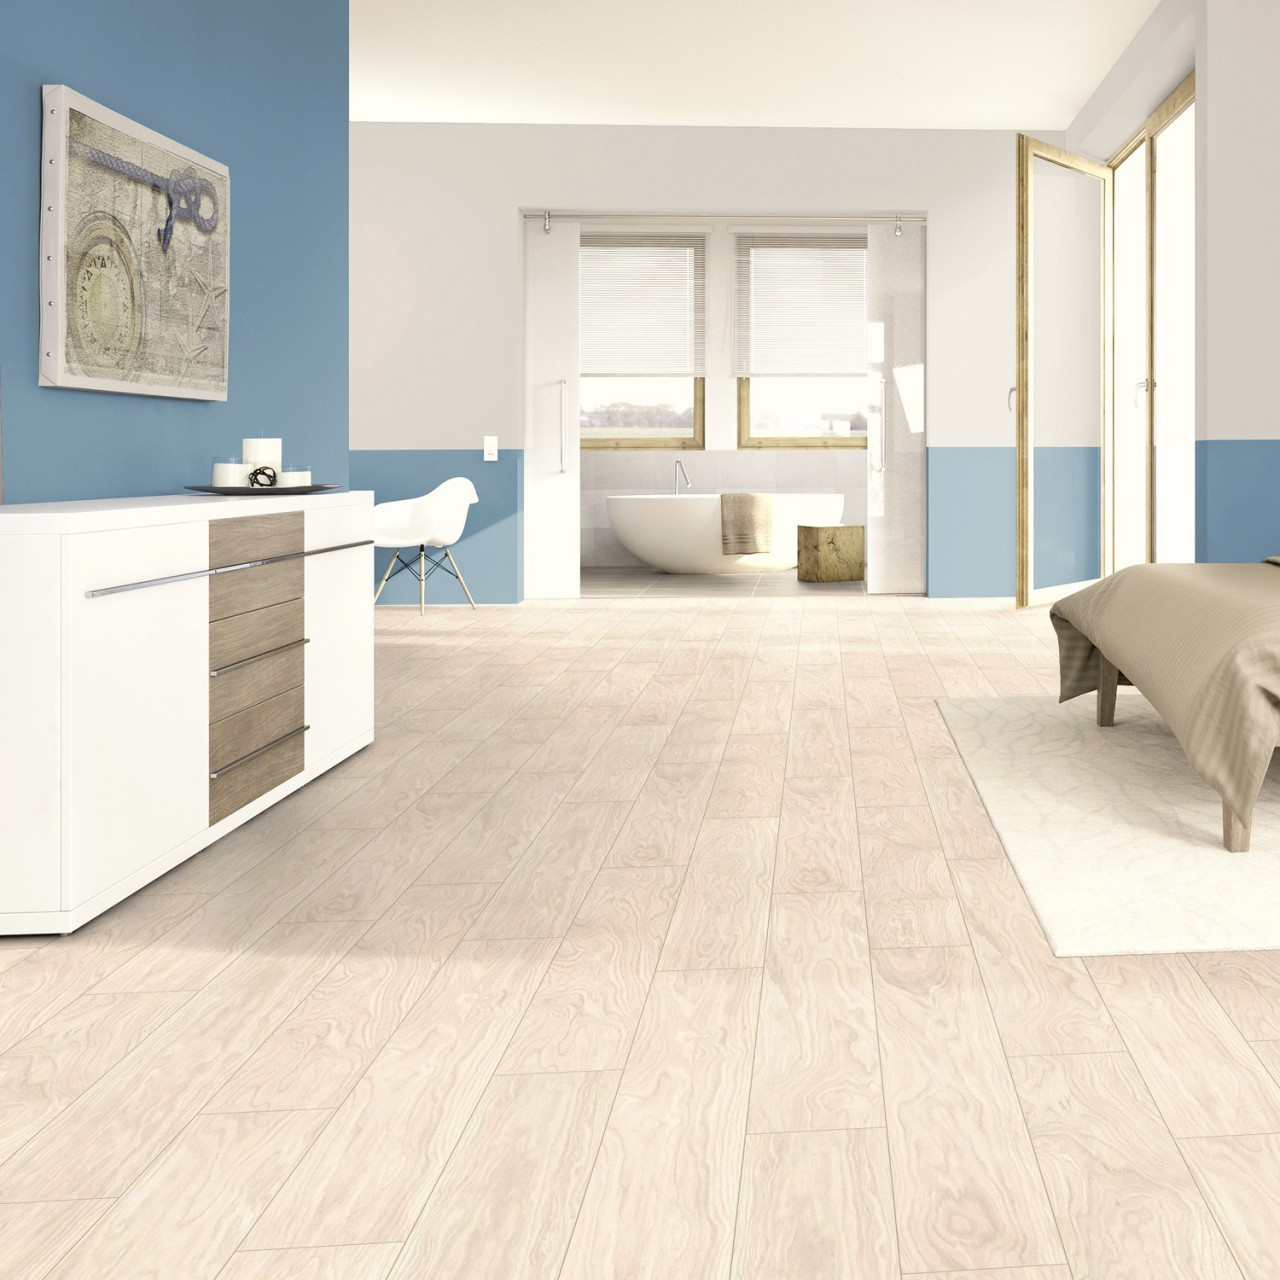 laminat marmoroptik best laminat marmoroptik with laminat. Black Bedroom Furniture Sets. Home Design Ideas